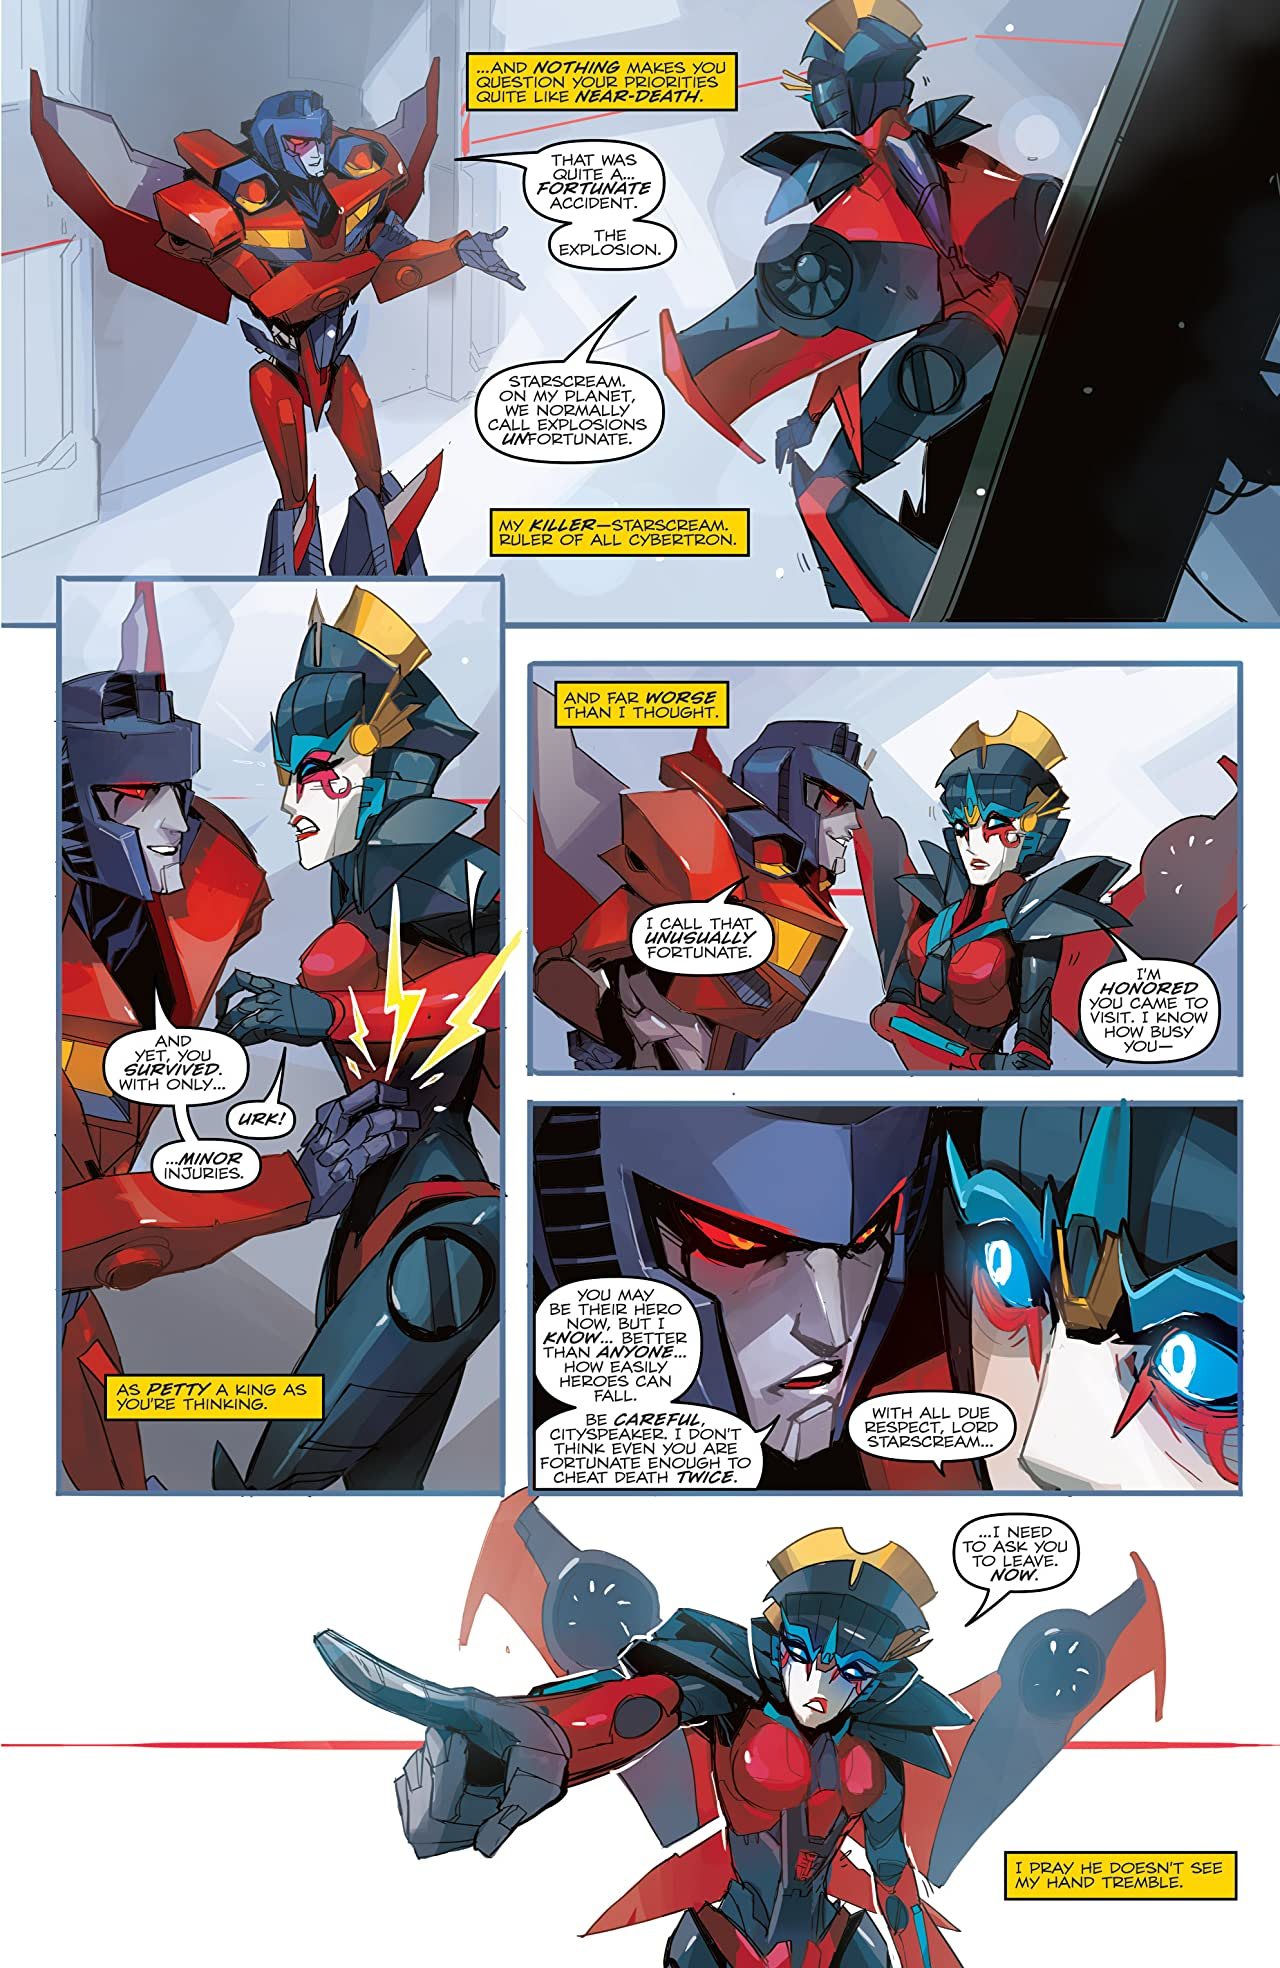 Transformers: Windblade #2 (of 4)